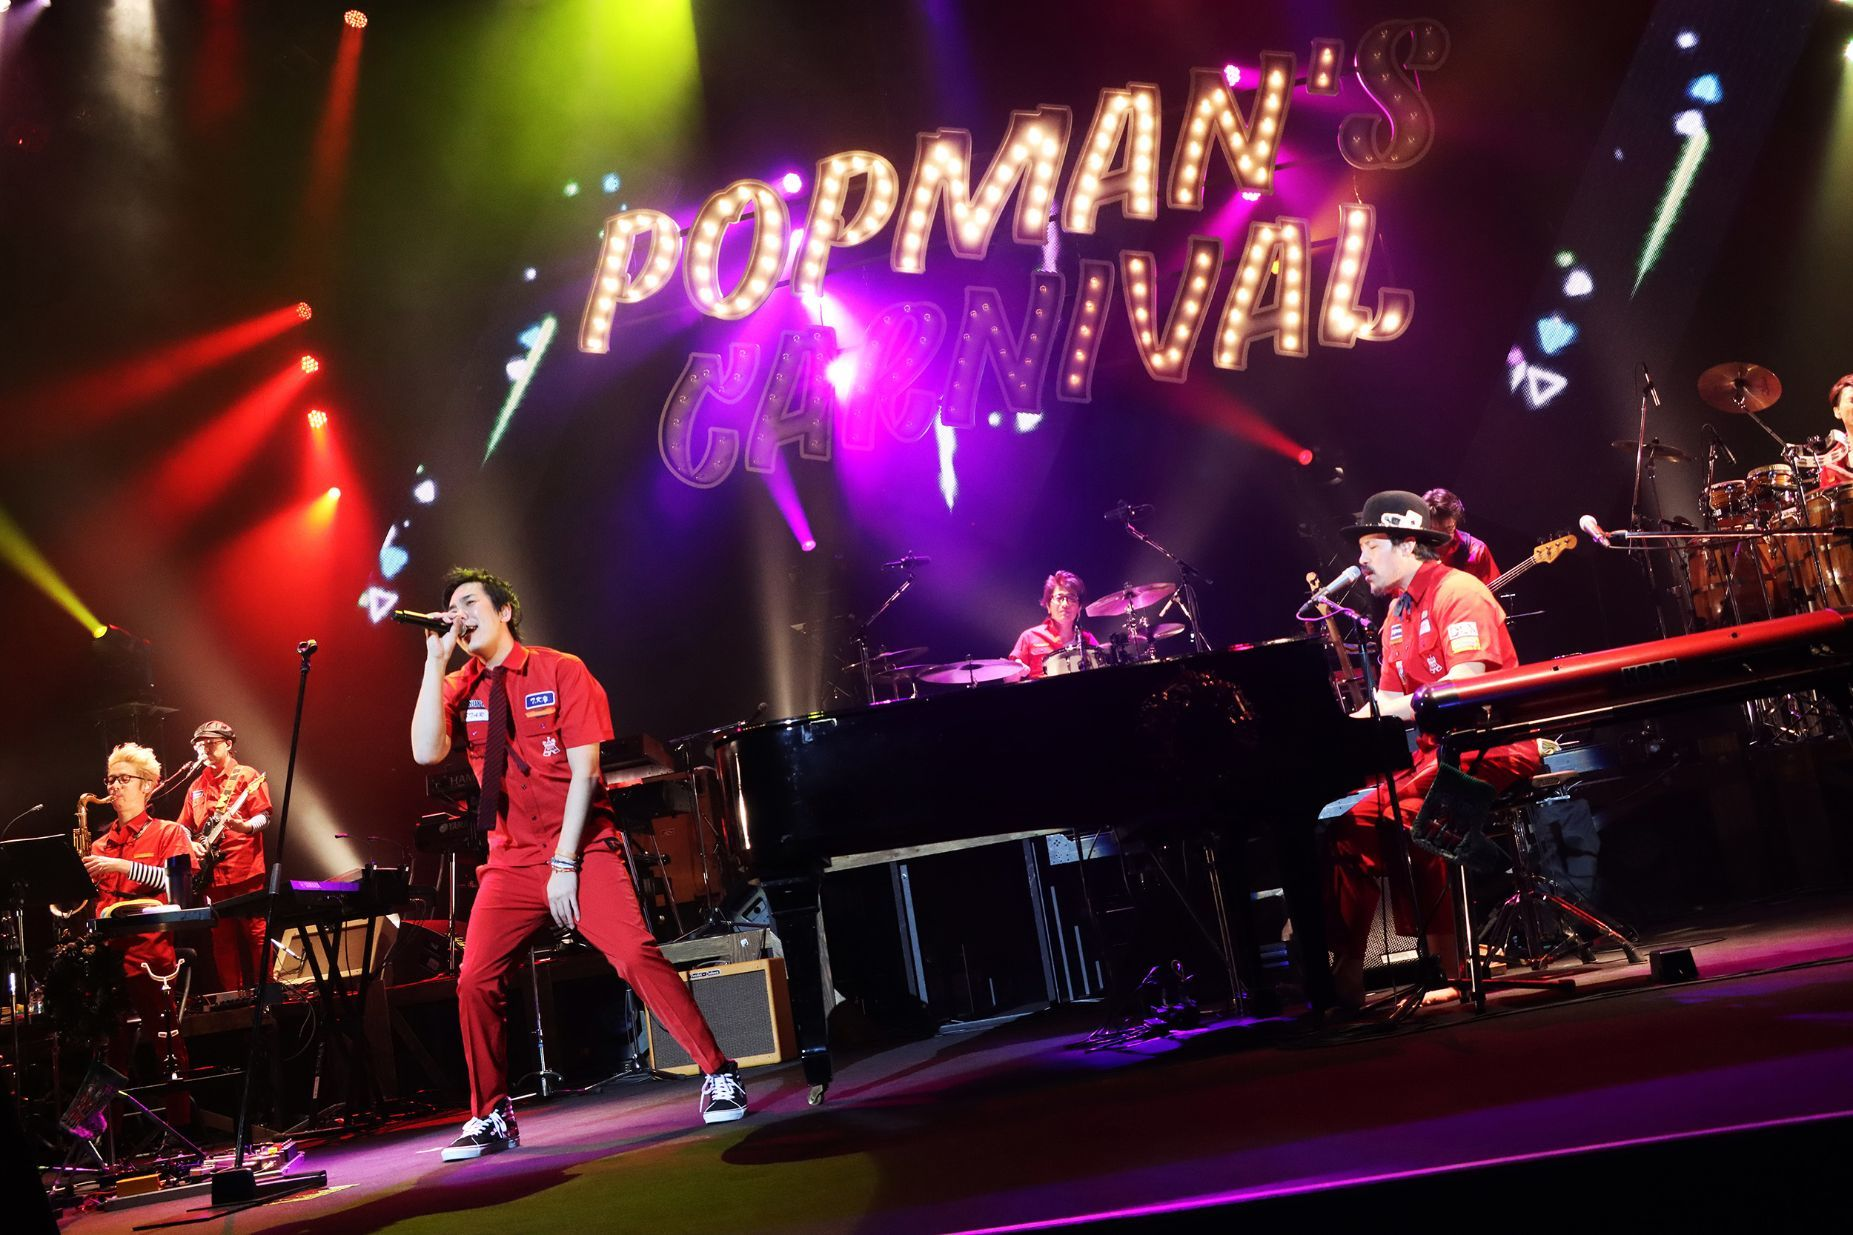 『SUKIMASWITCH TOUR 2019〜2020 POPMAN'S CARNIVAL Vol.2』2019年12月15日 東京 中野サンプラザ  撮影=岩佐篤樹